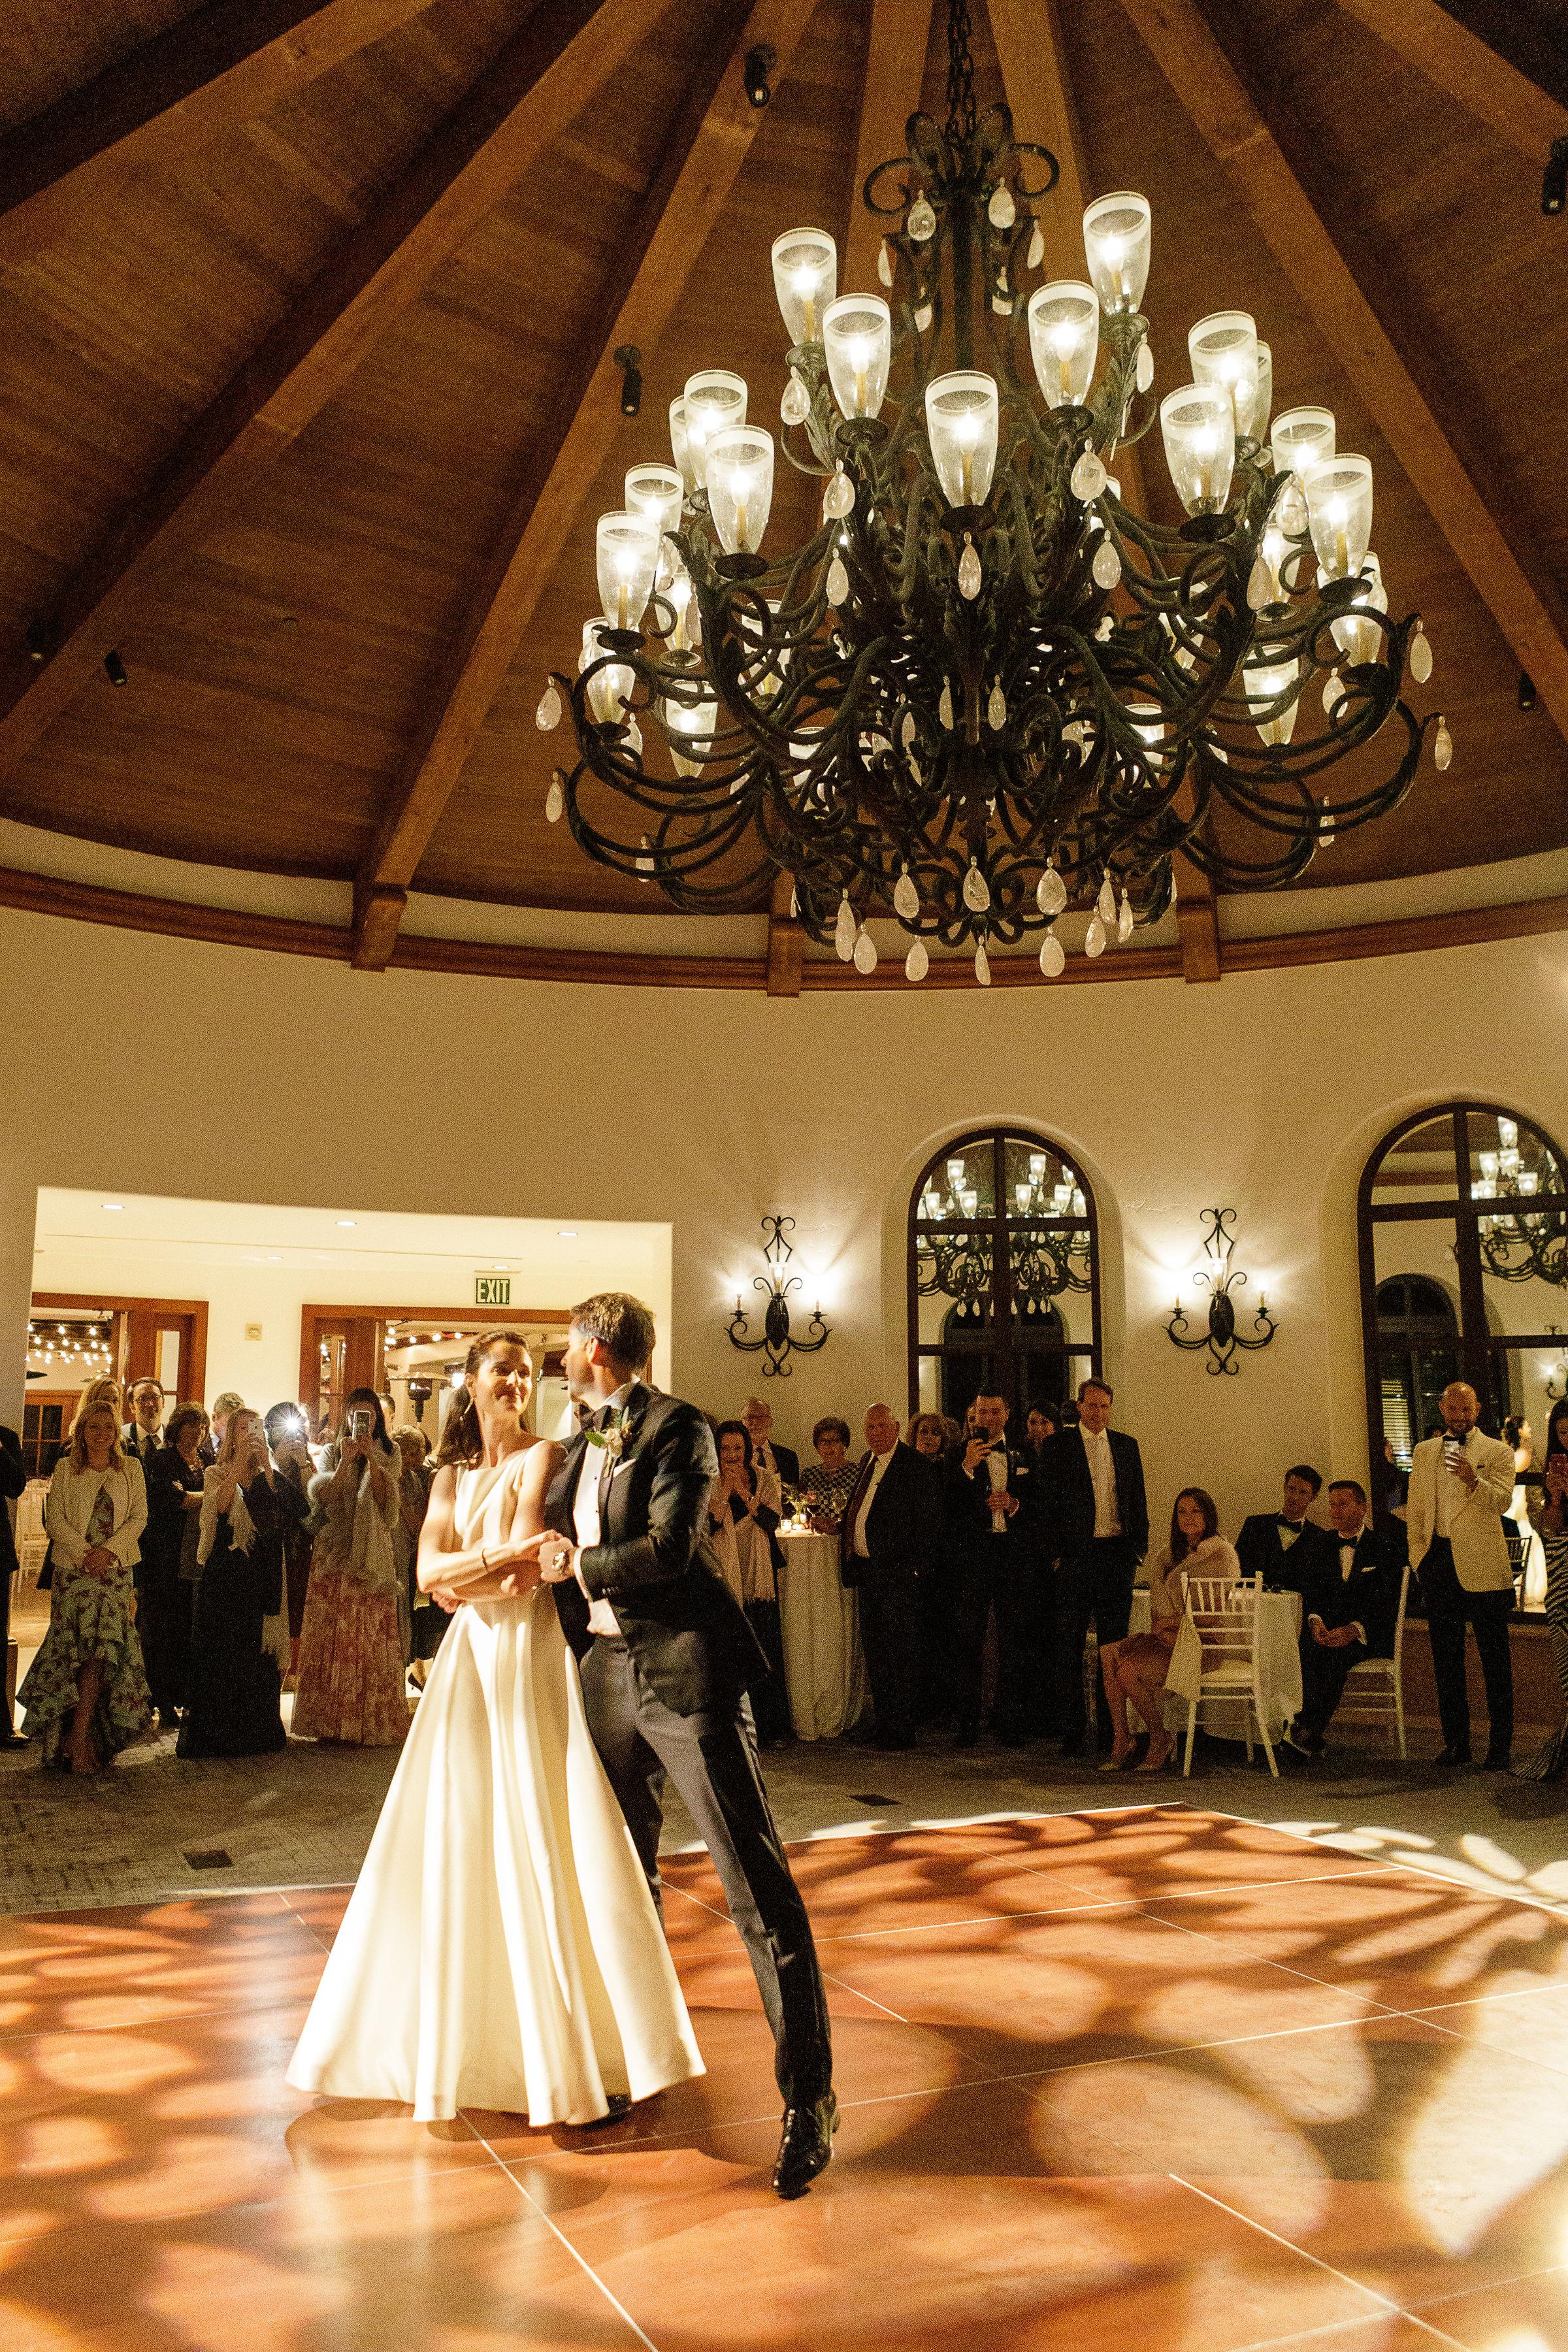 www.santabarbarawedding.com   Kiel Rucker Photography   The Ritz Carlton Bacara   Event of the Season   Brian Fowler   Couple's First Dance